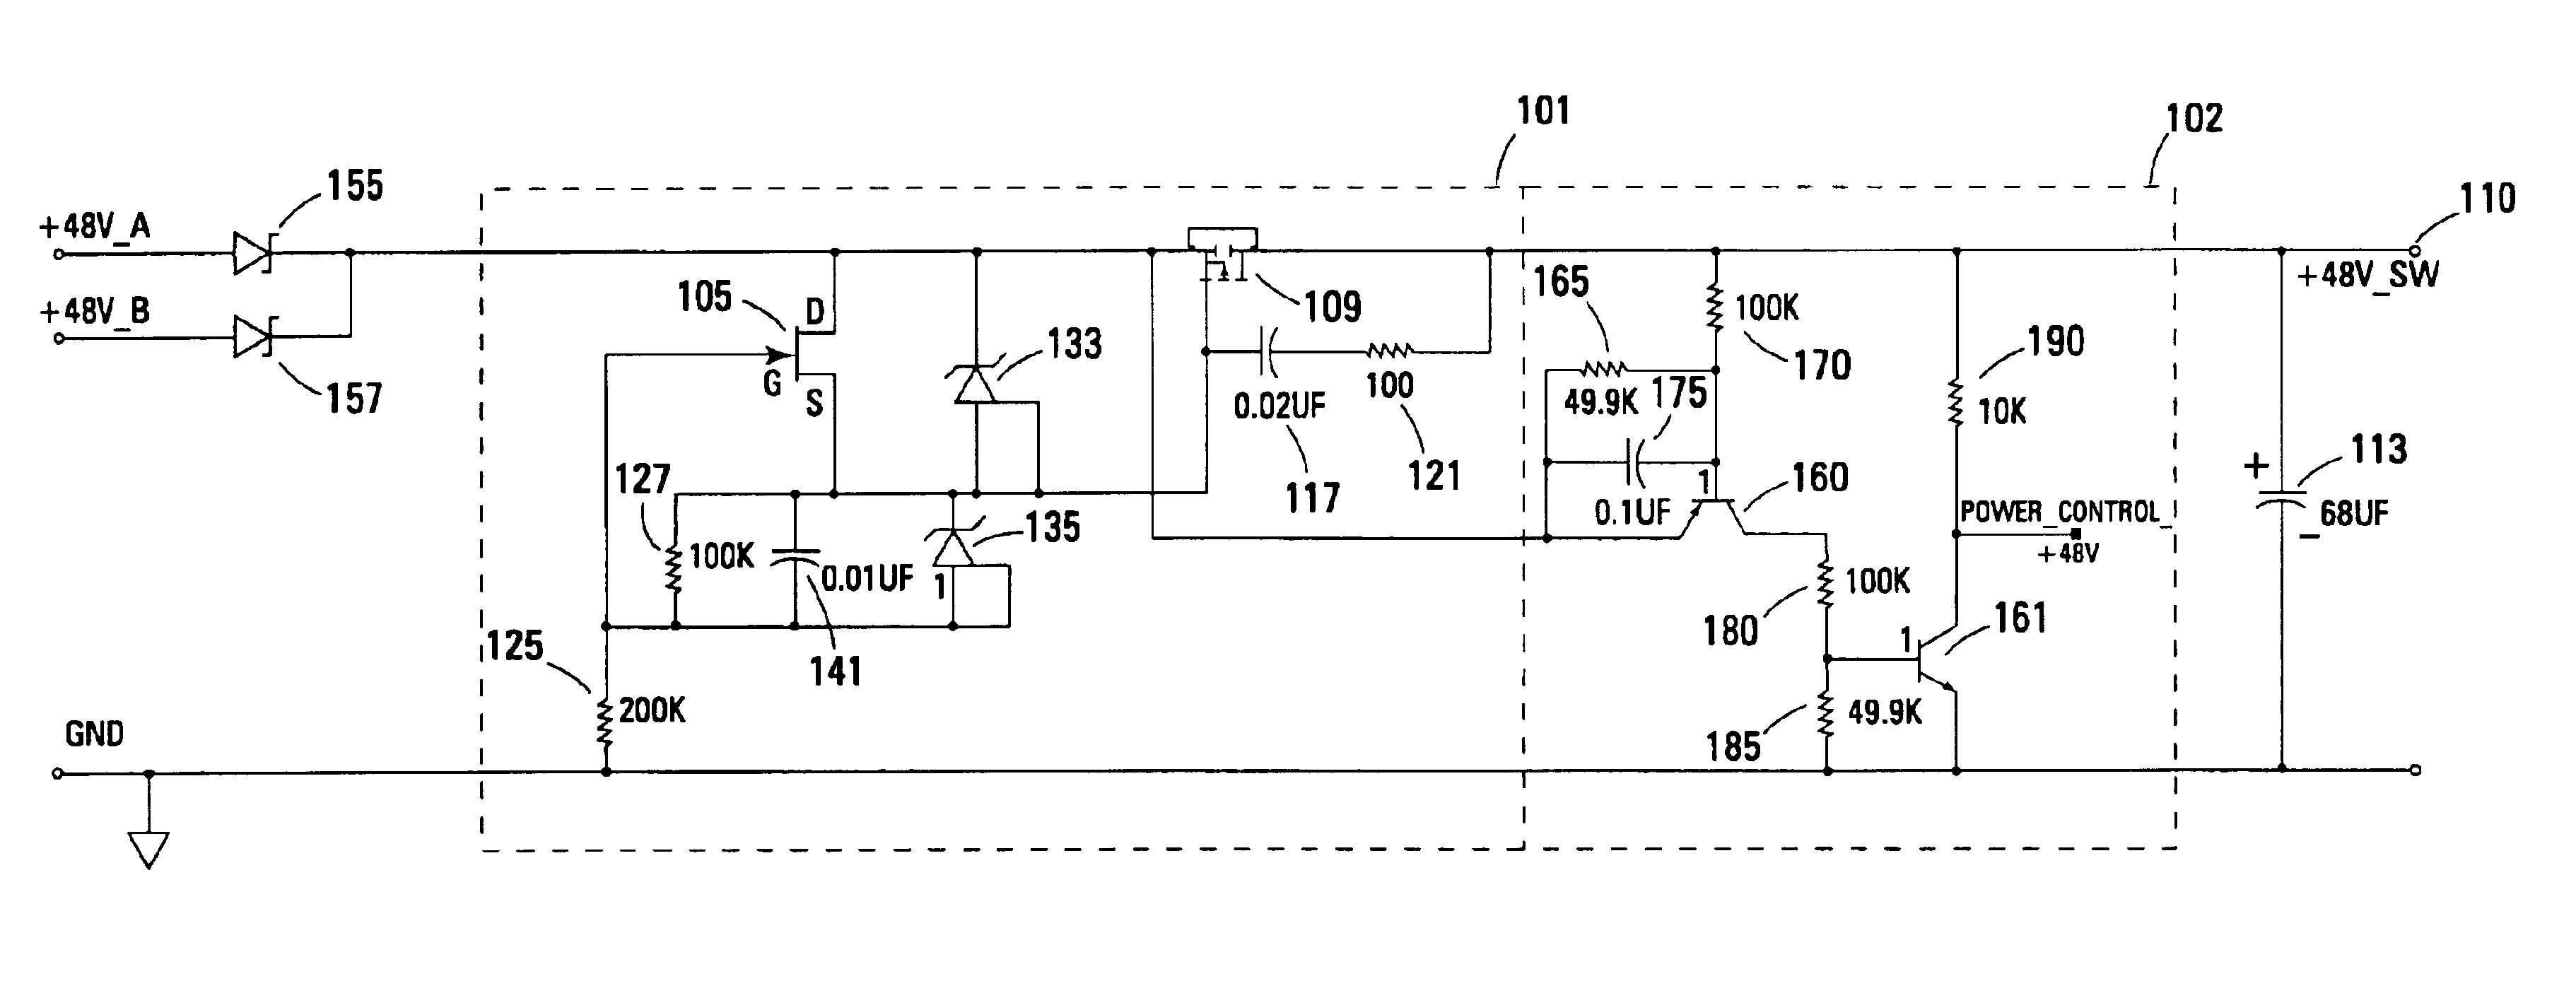 inrush current limiter circuit inrush current limiting current